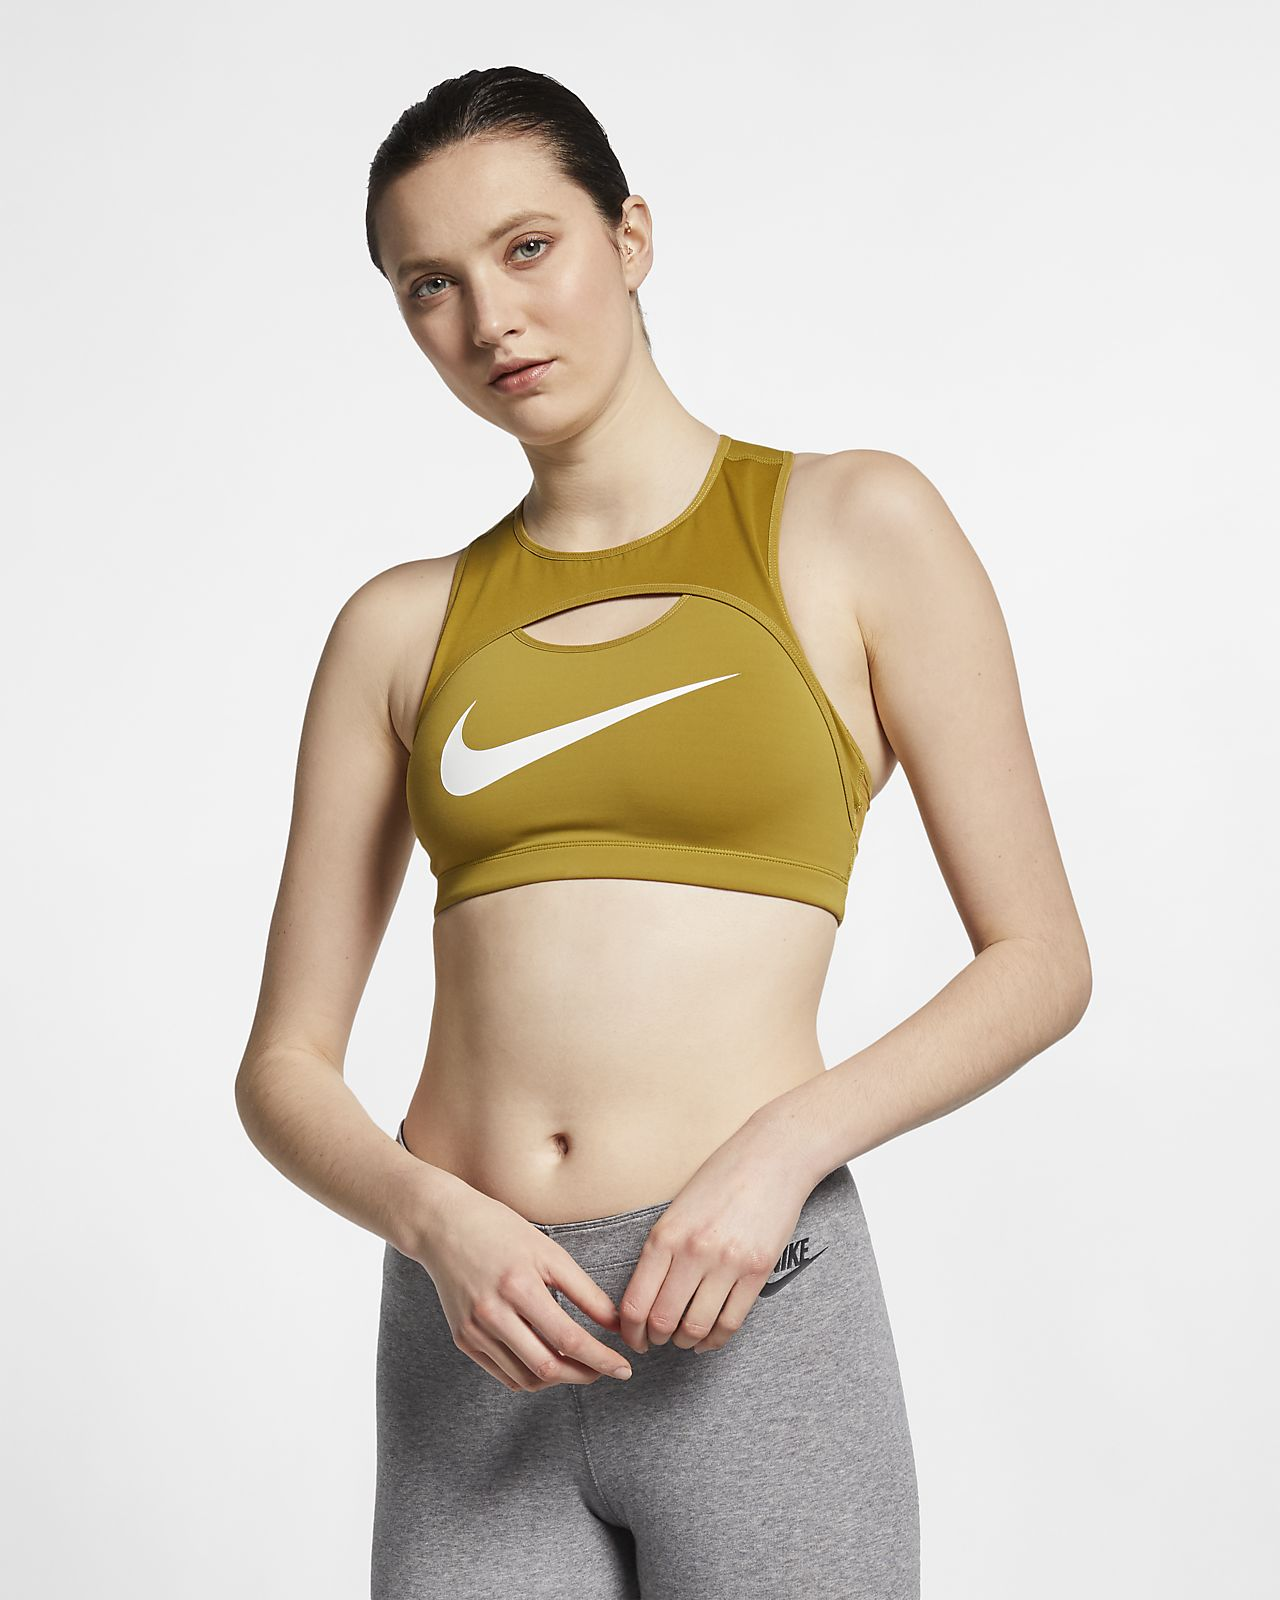 NikeLab Collection Women's Medium Support Sports Bra